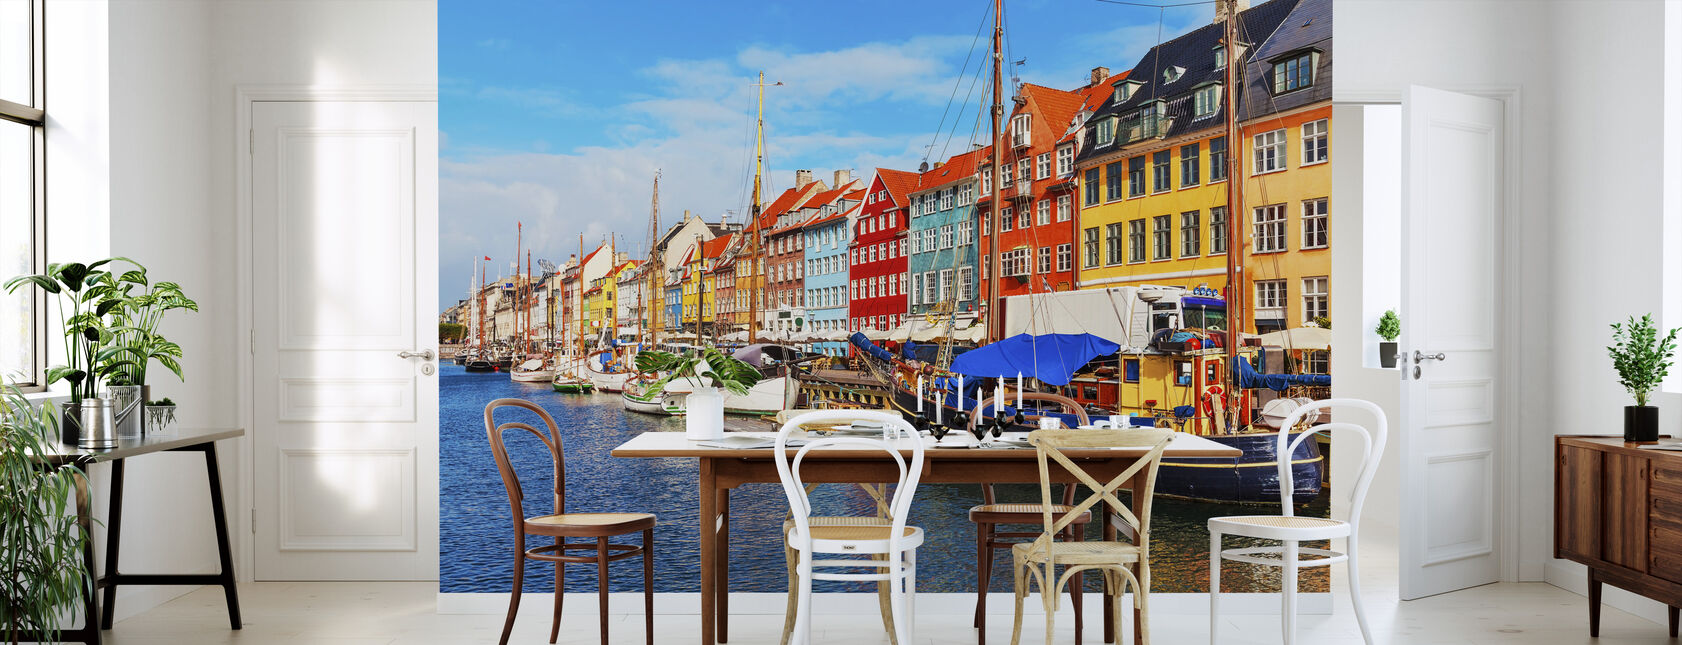 Summer View of Nyhavn Pier - Wallpaper - Kitchen